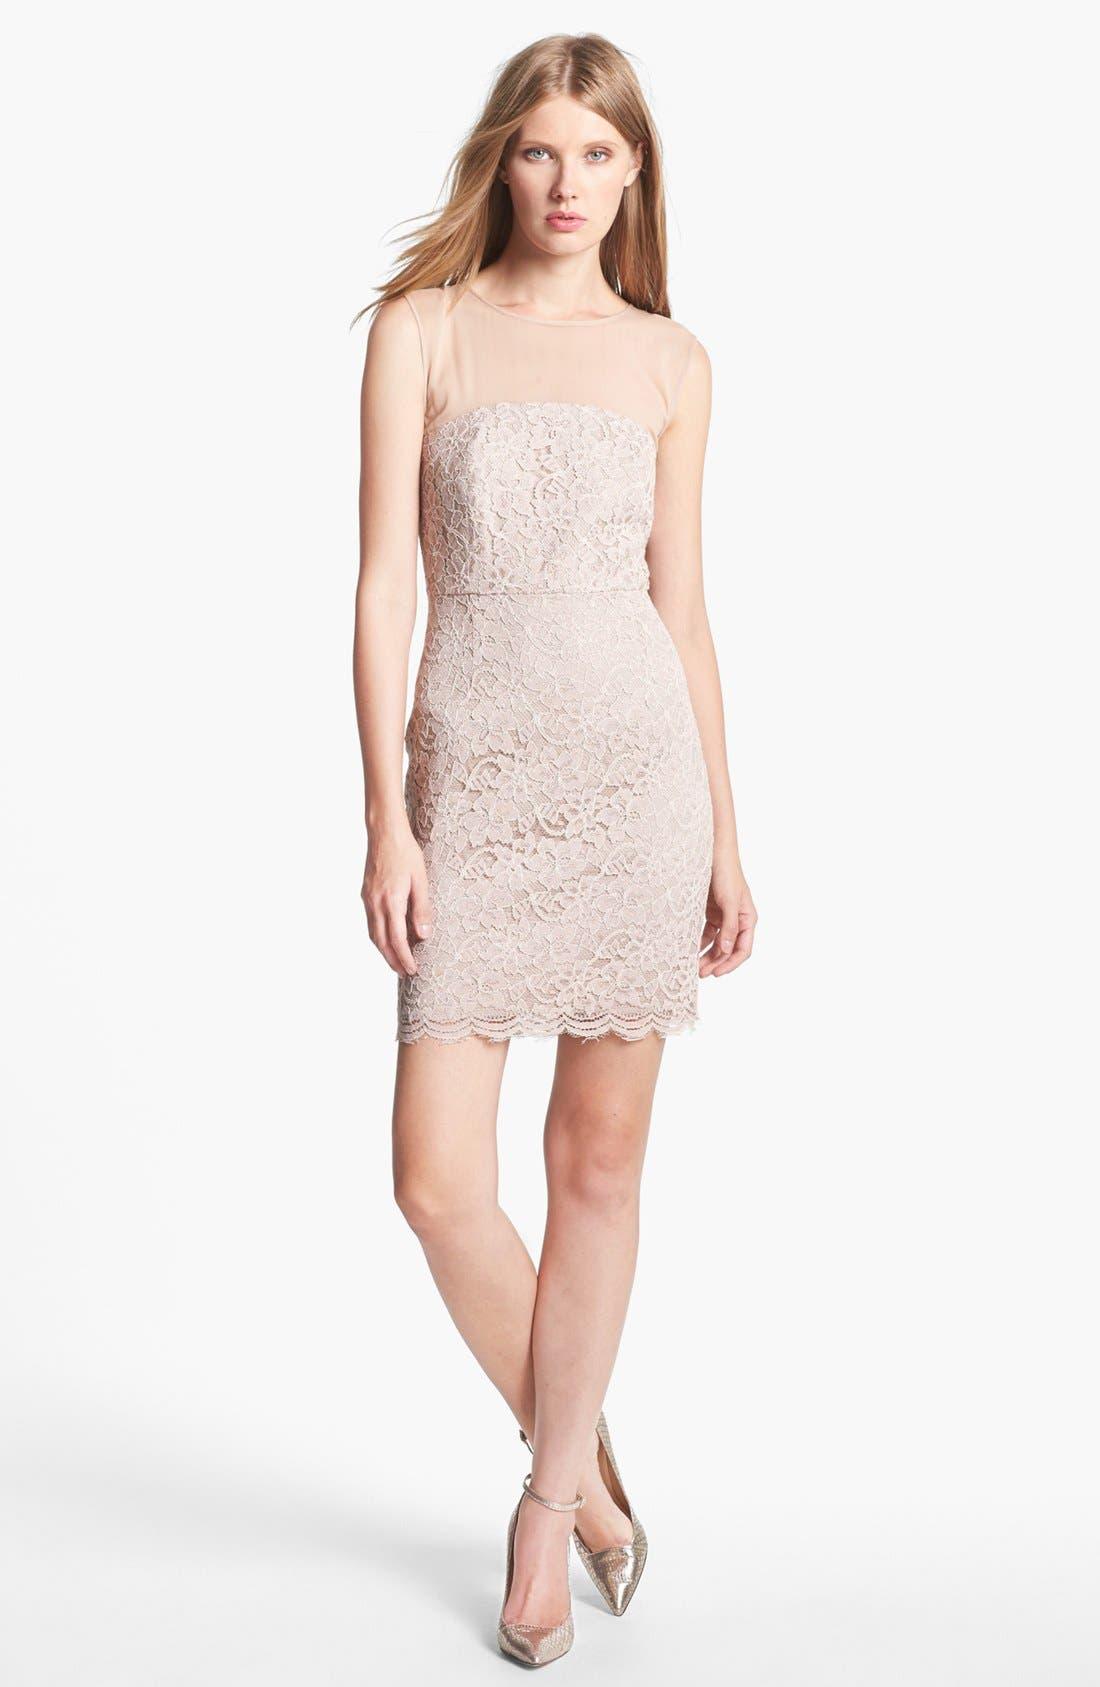 Alternate Image 1 Selected - Diane von Furstenberg 'Nisha' Lace Sheath Dress